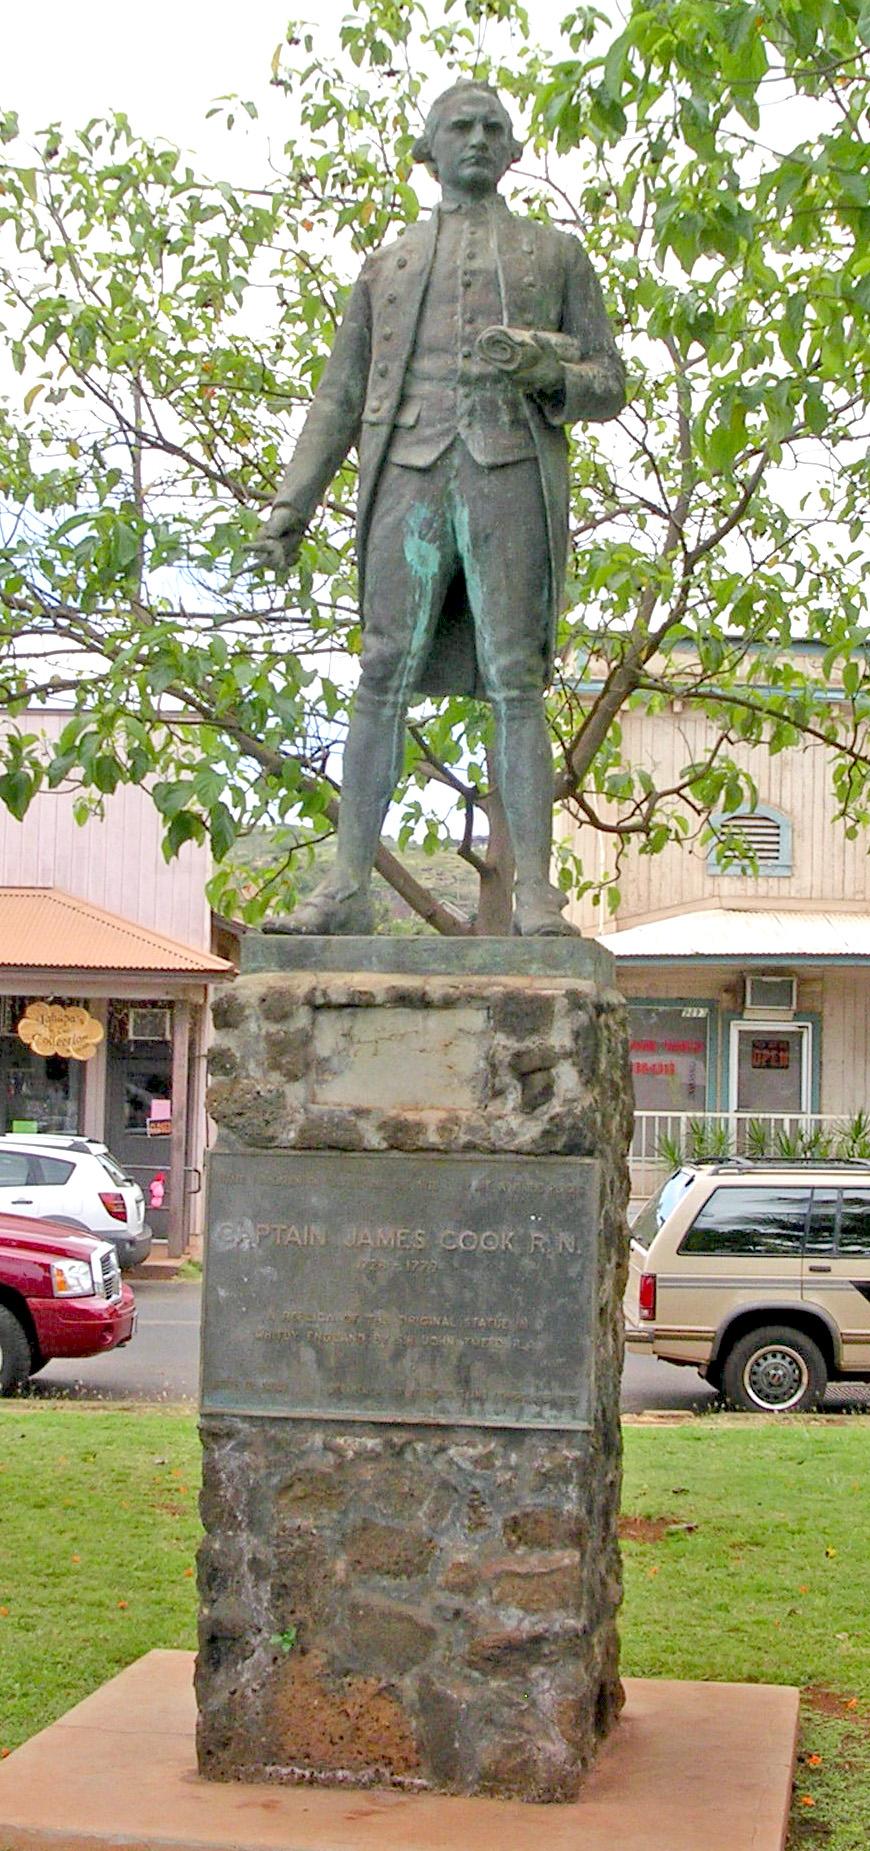 James Cook Monument at Waimea, Kauai. Photo taken on May 15, 2005.